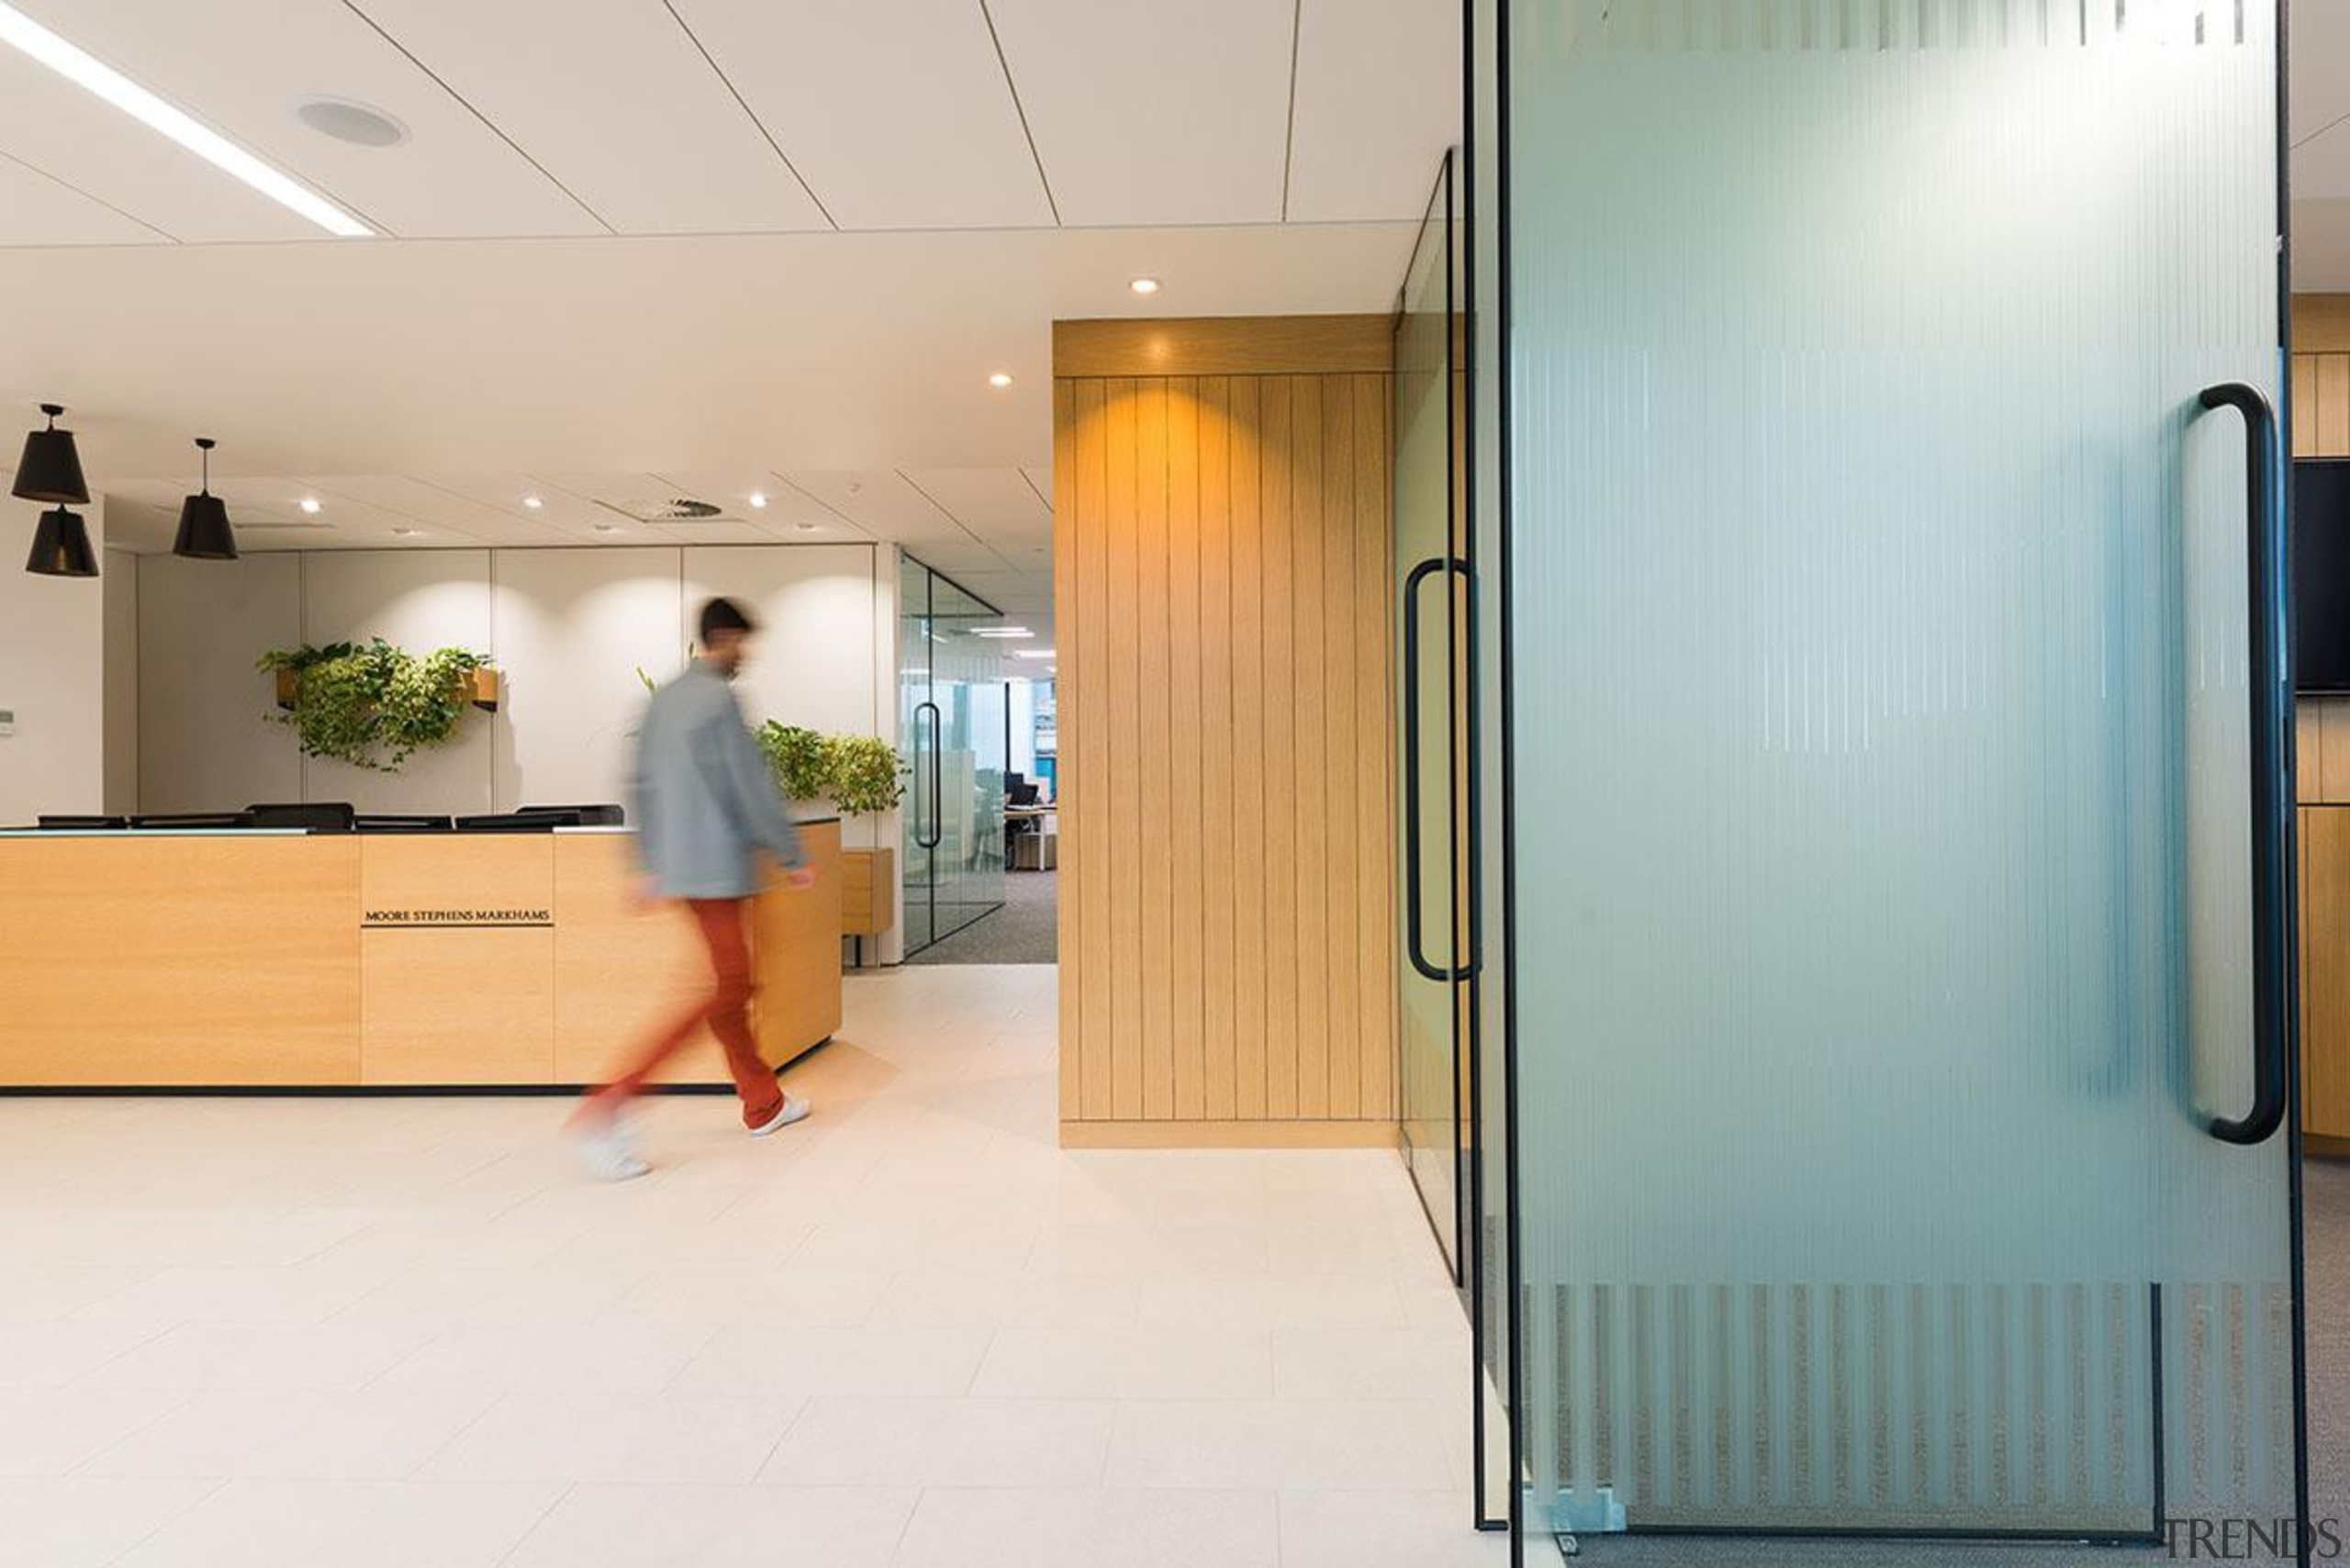 MERIT WINNERThree35 (3 of 4) - Hays Commercial floor, flooring, institution, interior design, product design, white, gray